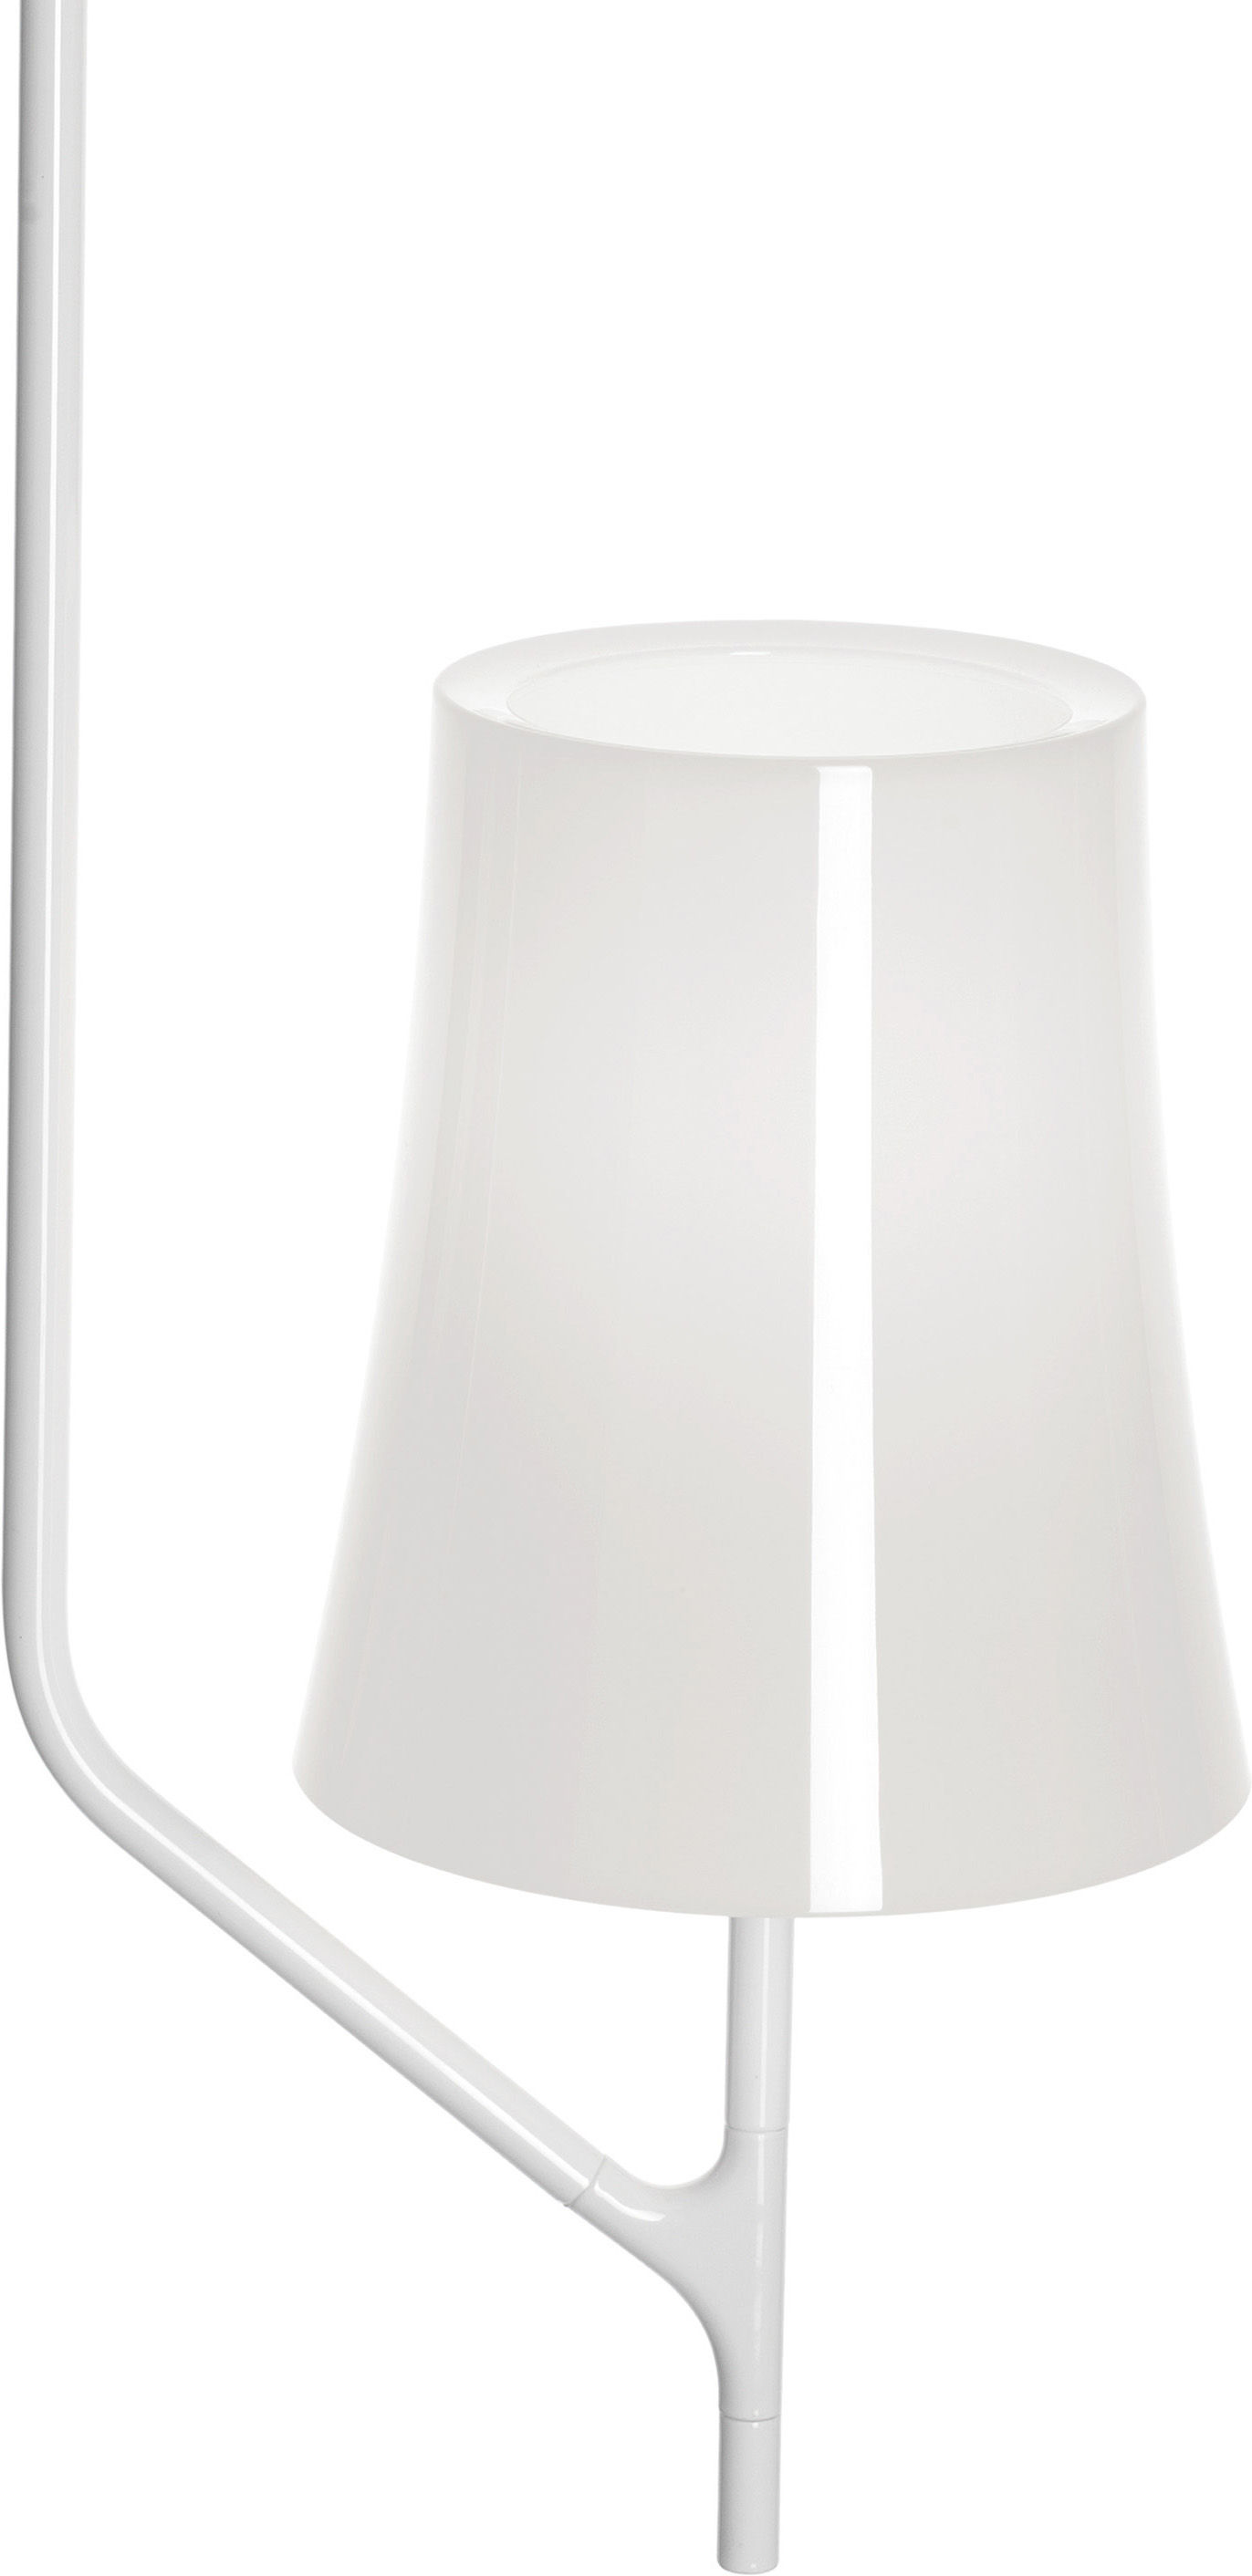 Luminaire - Suspensions - Suspension Birdie / 1 bras - Foscarini - 1 bras / Blanc - Acier inoxydable verni, Polycarbonate